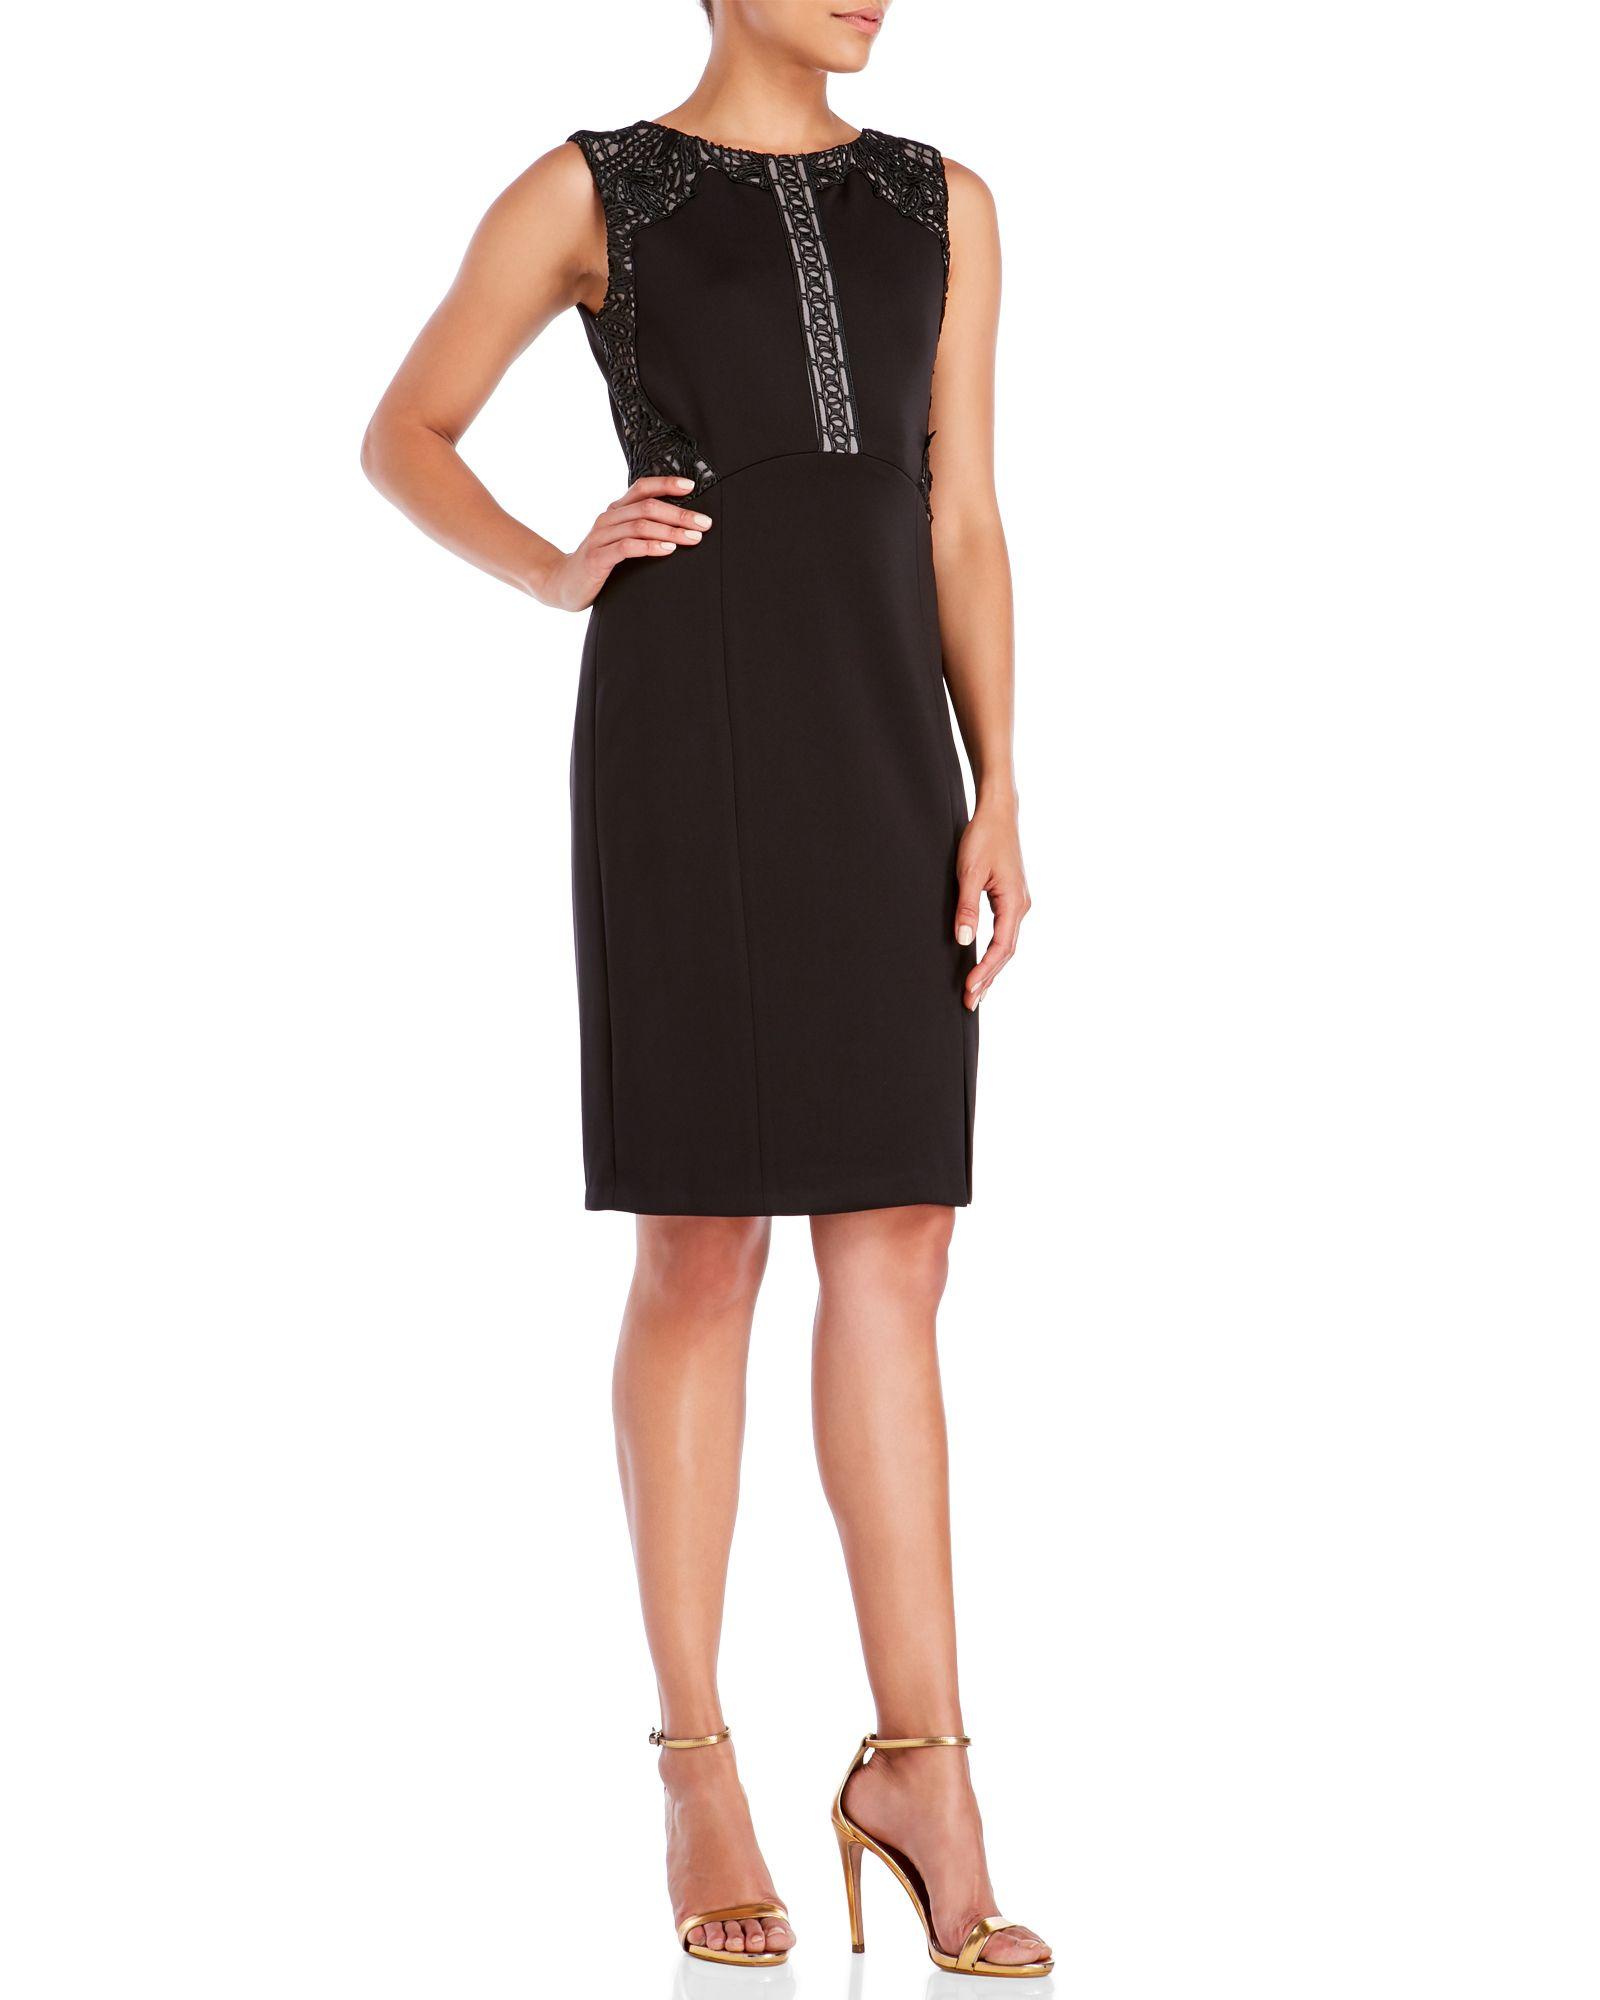 Black Sheath Dress Accessories | www.galleryhip.com - The ...